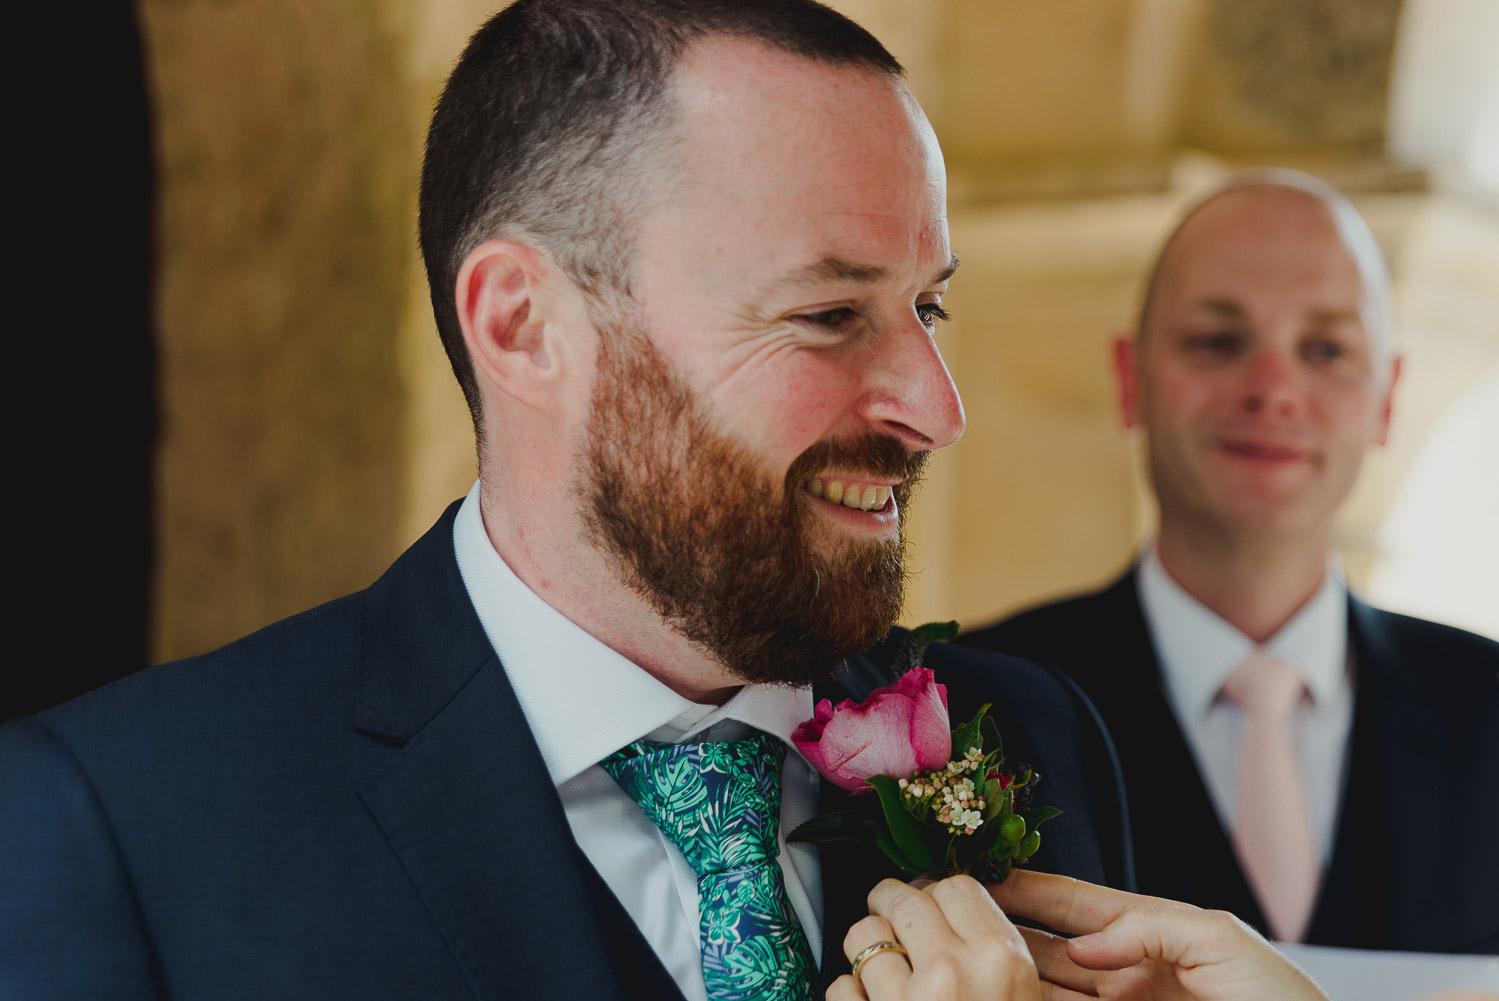 gascony_bordeaux_south_west_france_wedding_tarn_katy_webb_photography_UK52